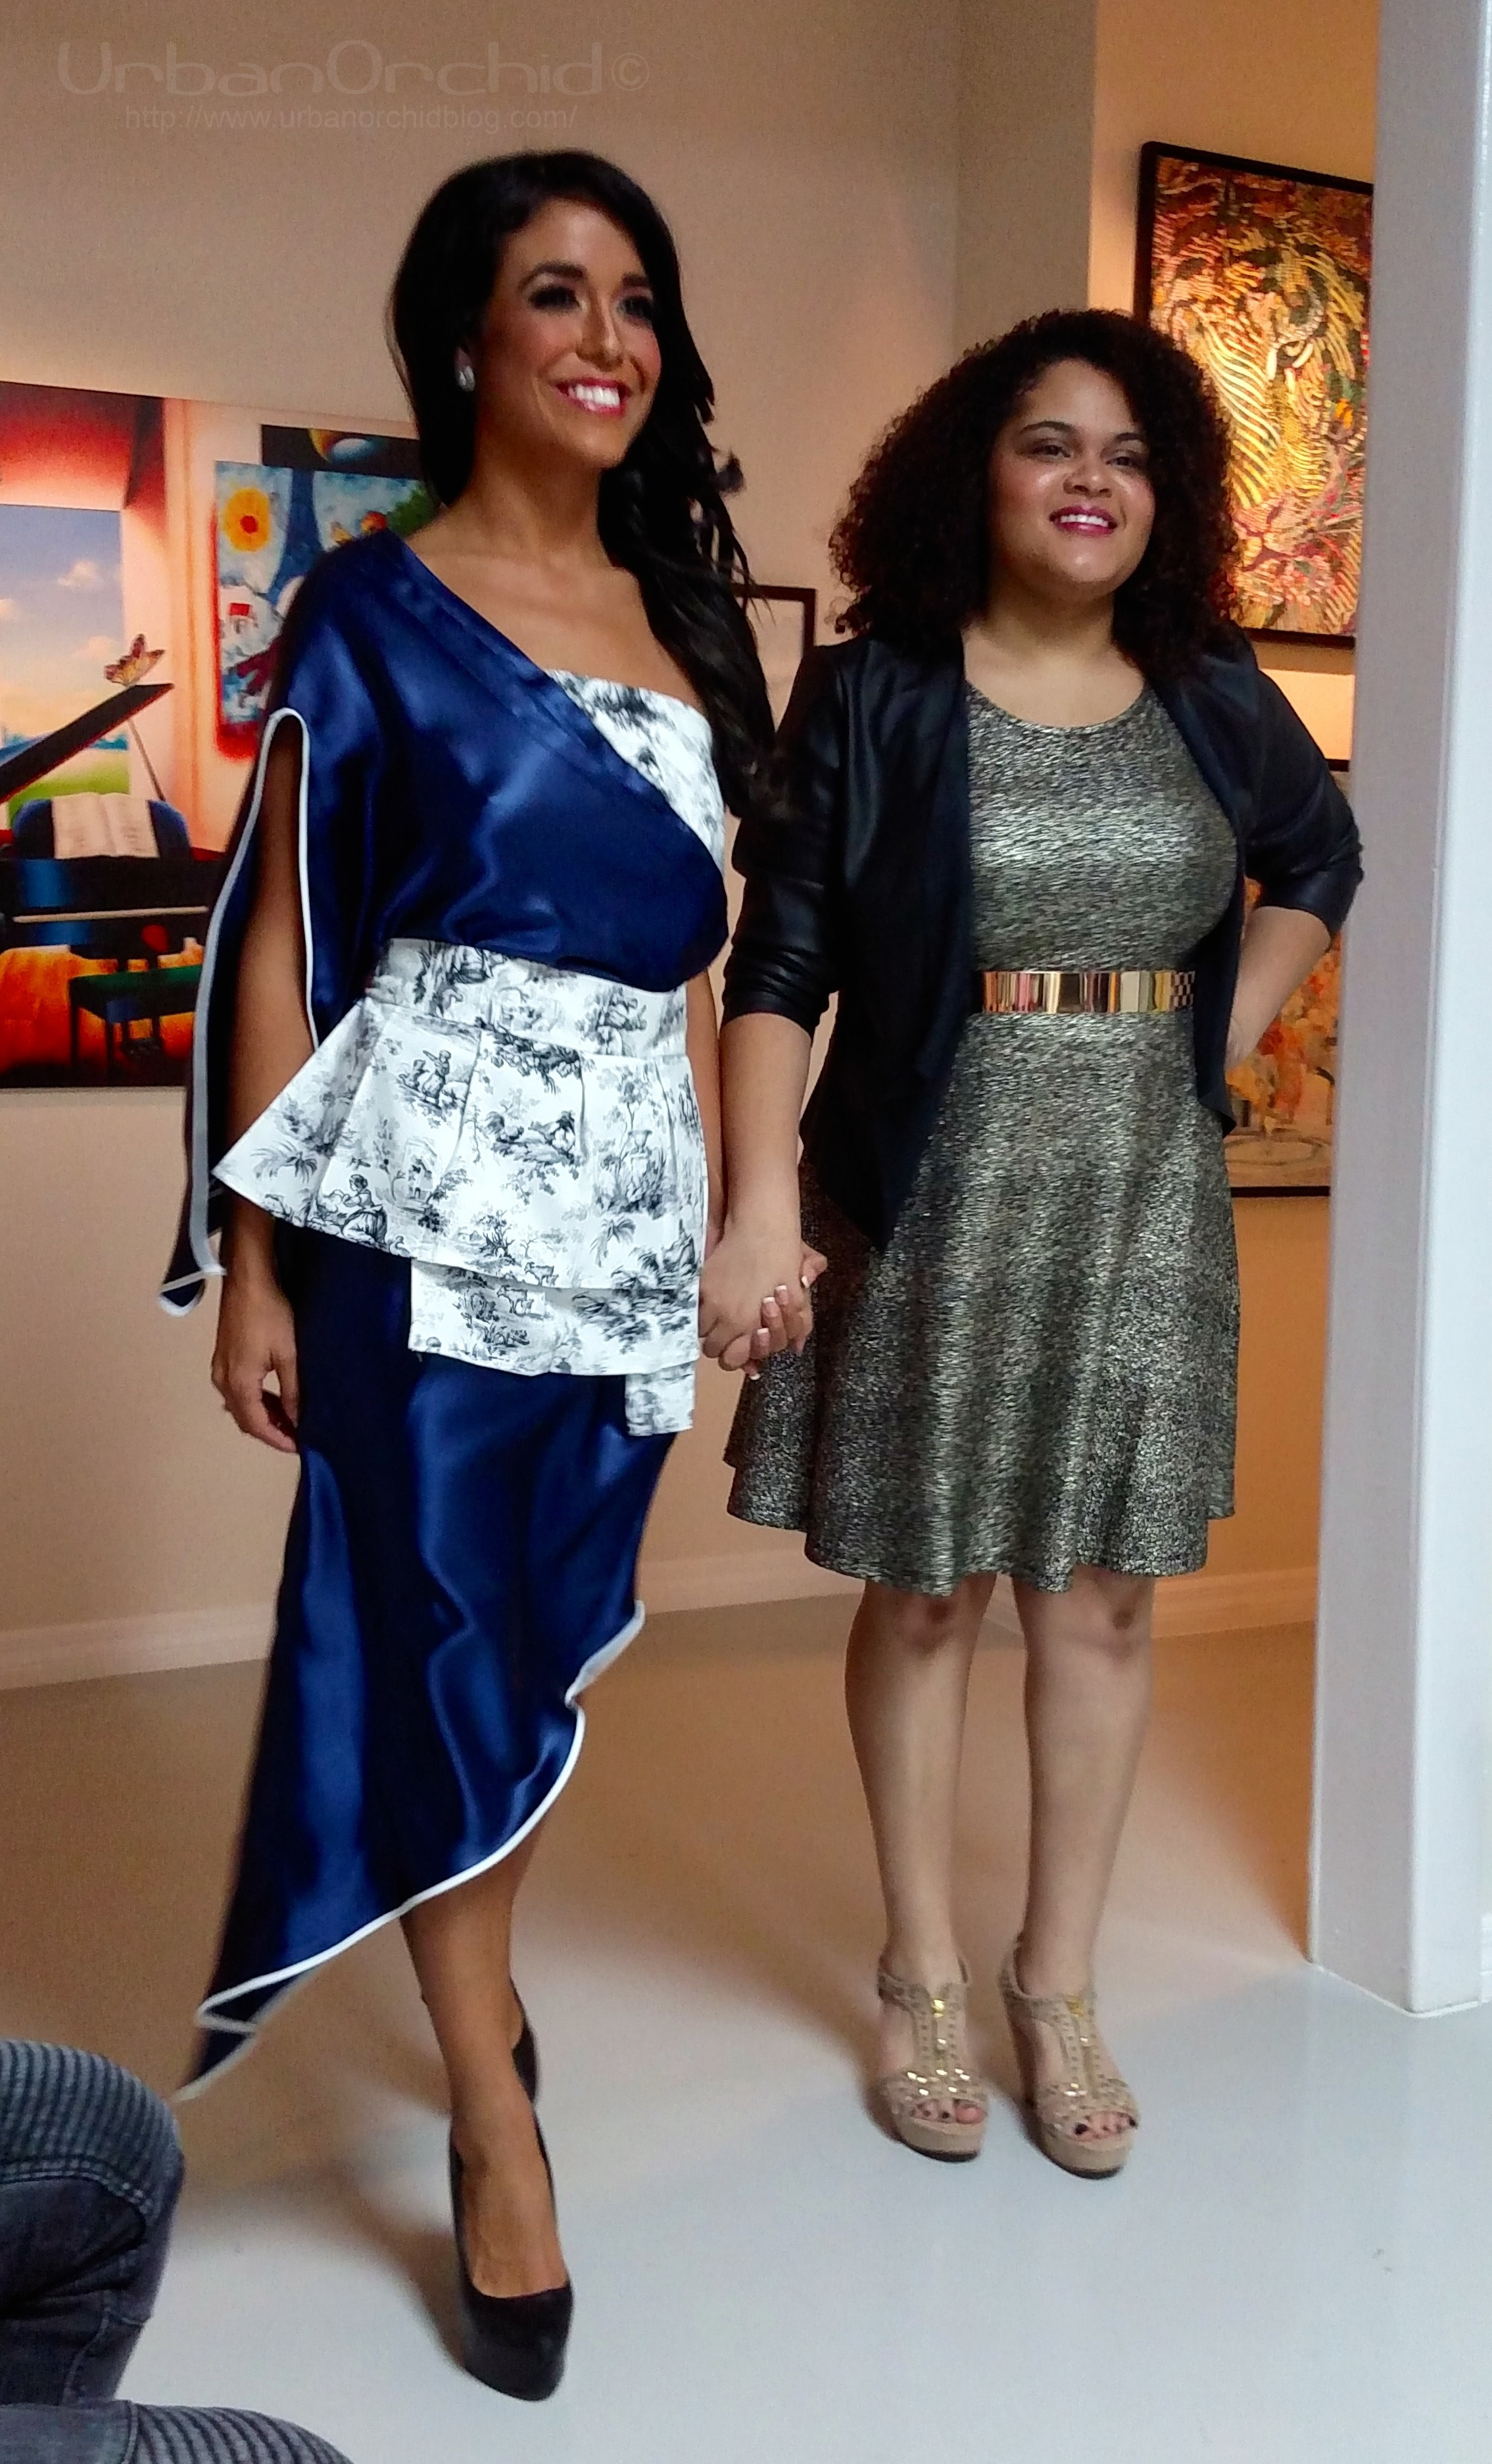 Model with the designer herself, Senia Soto.